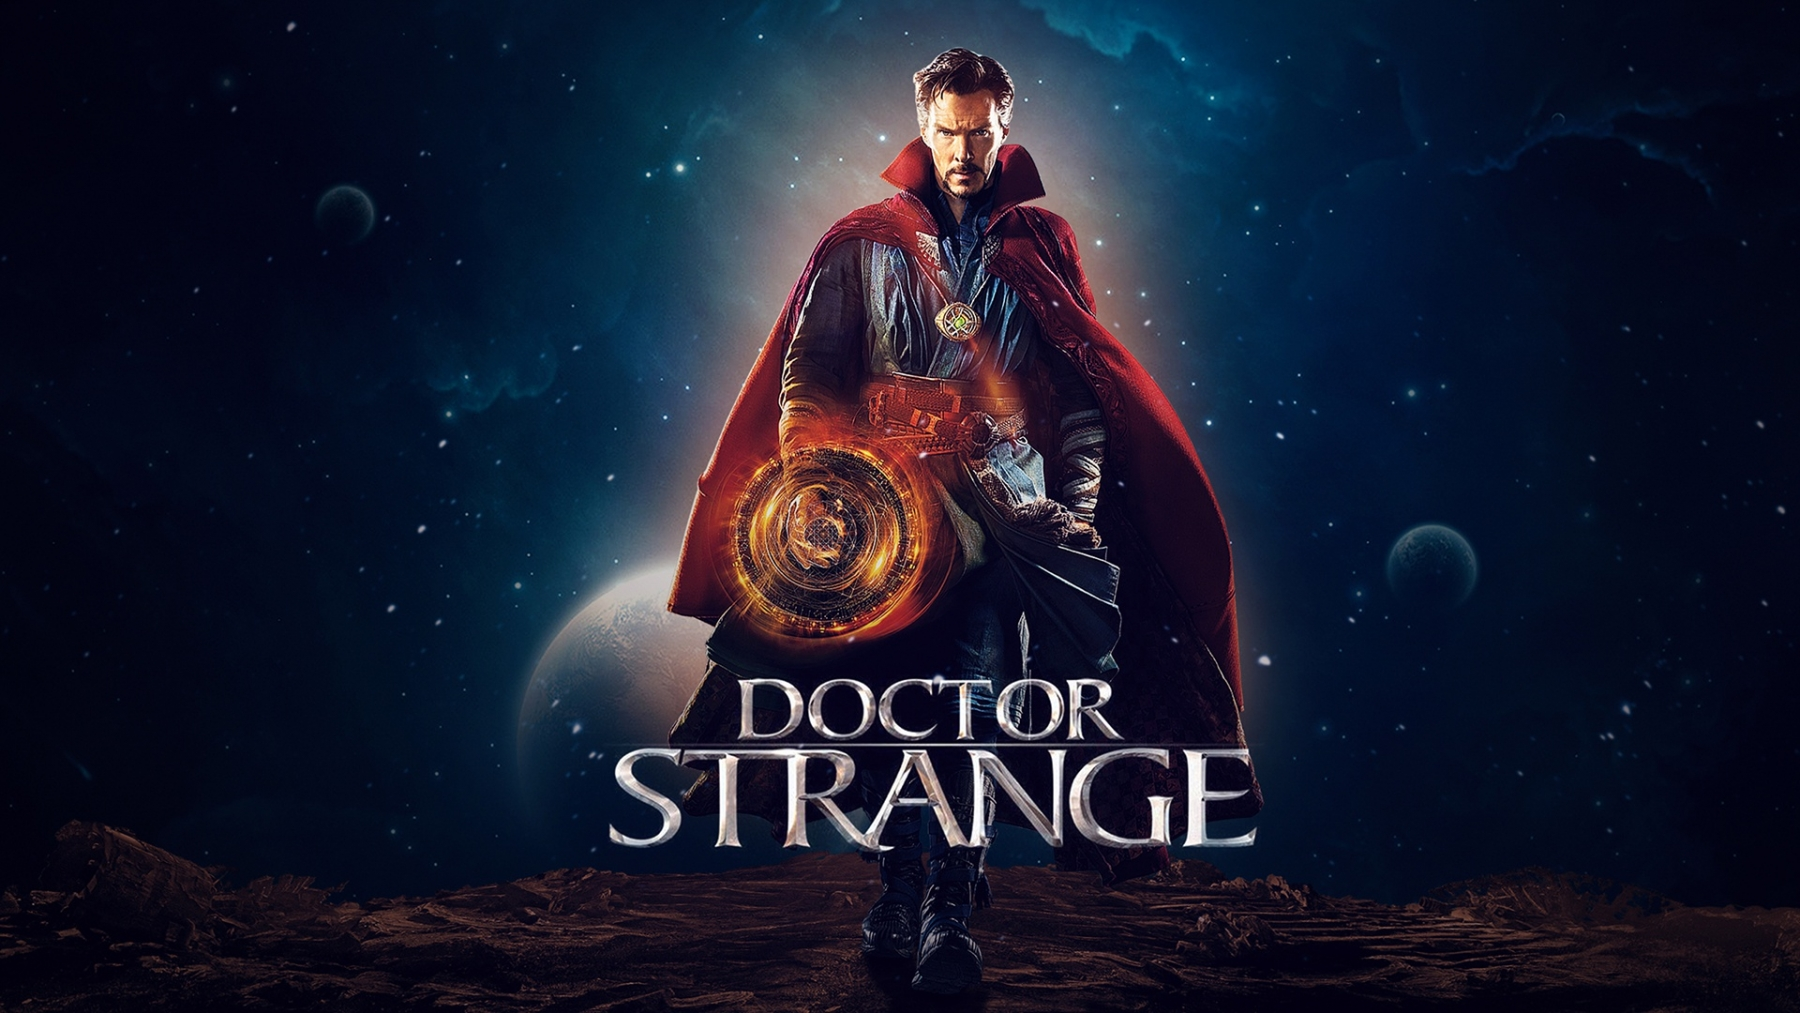 Doctor Strange Hd Wallpaper Collection Yl Computing